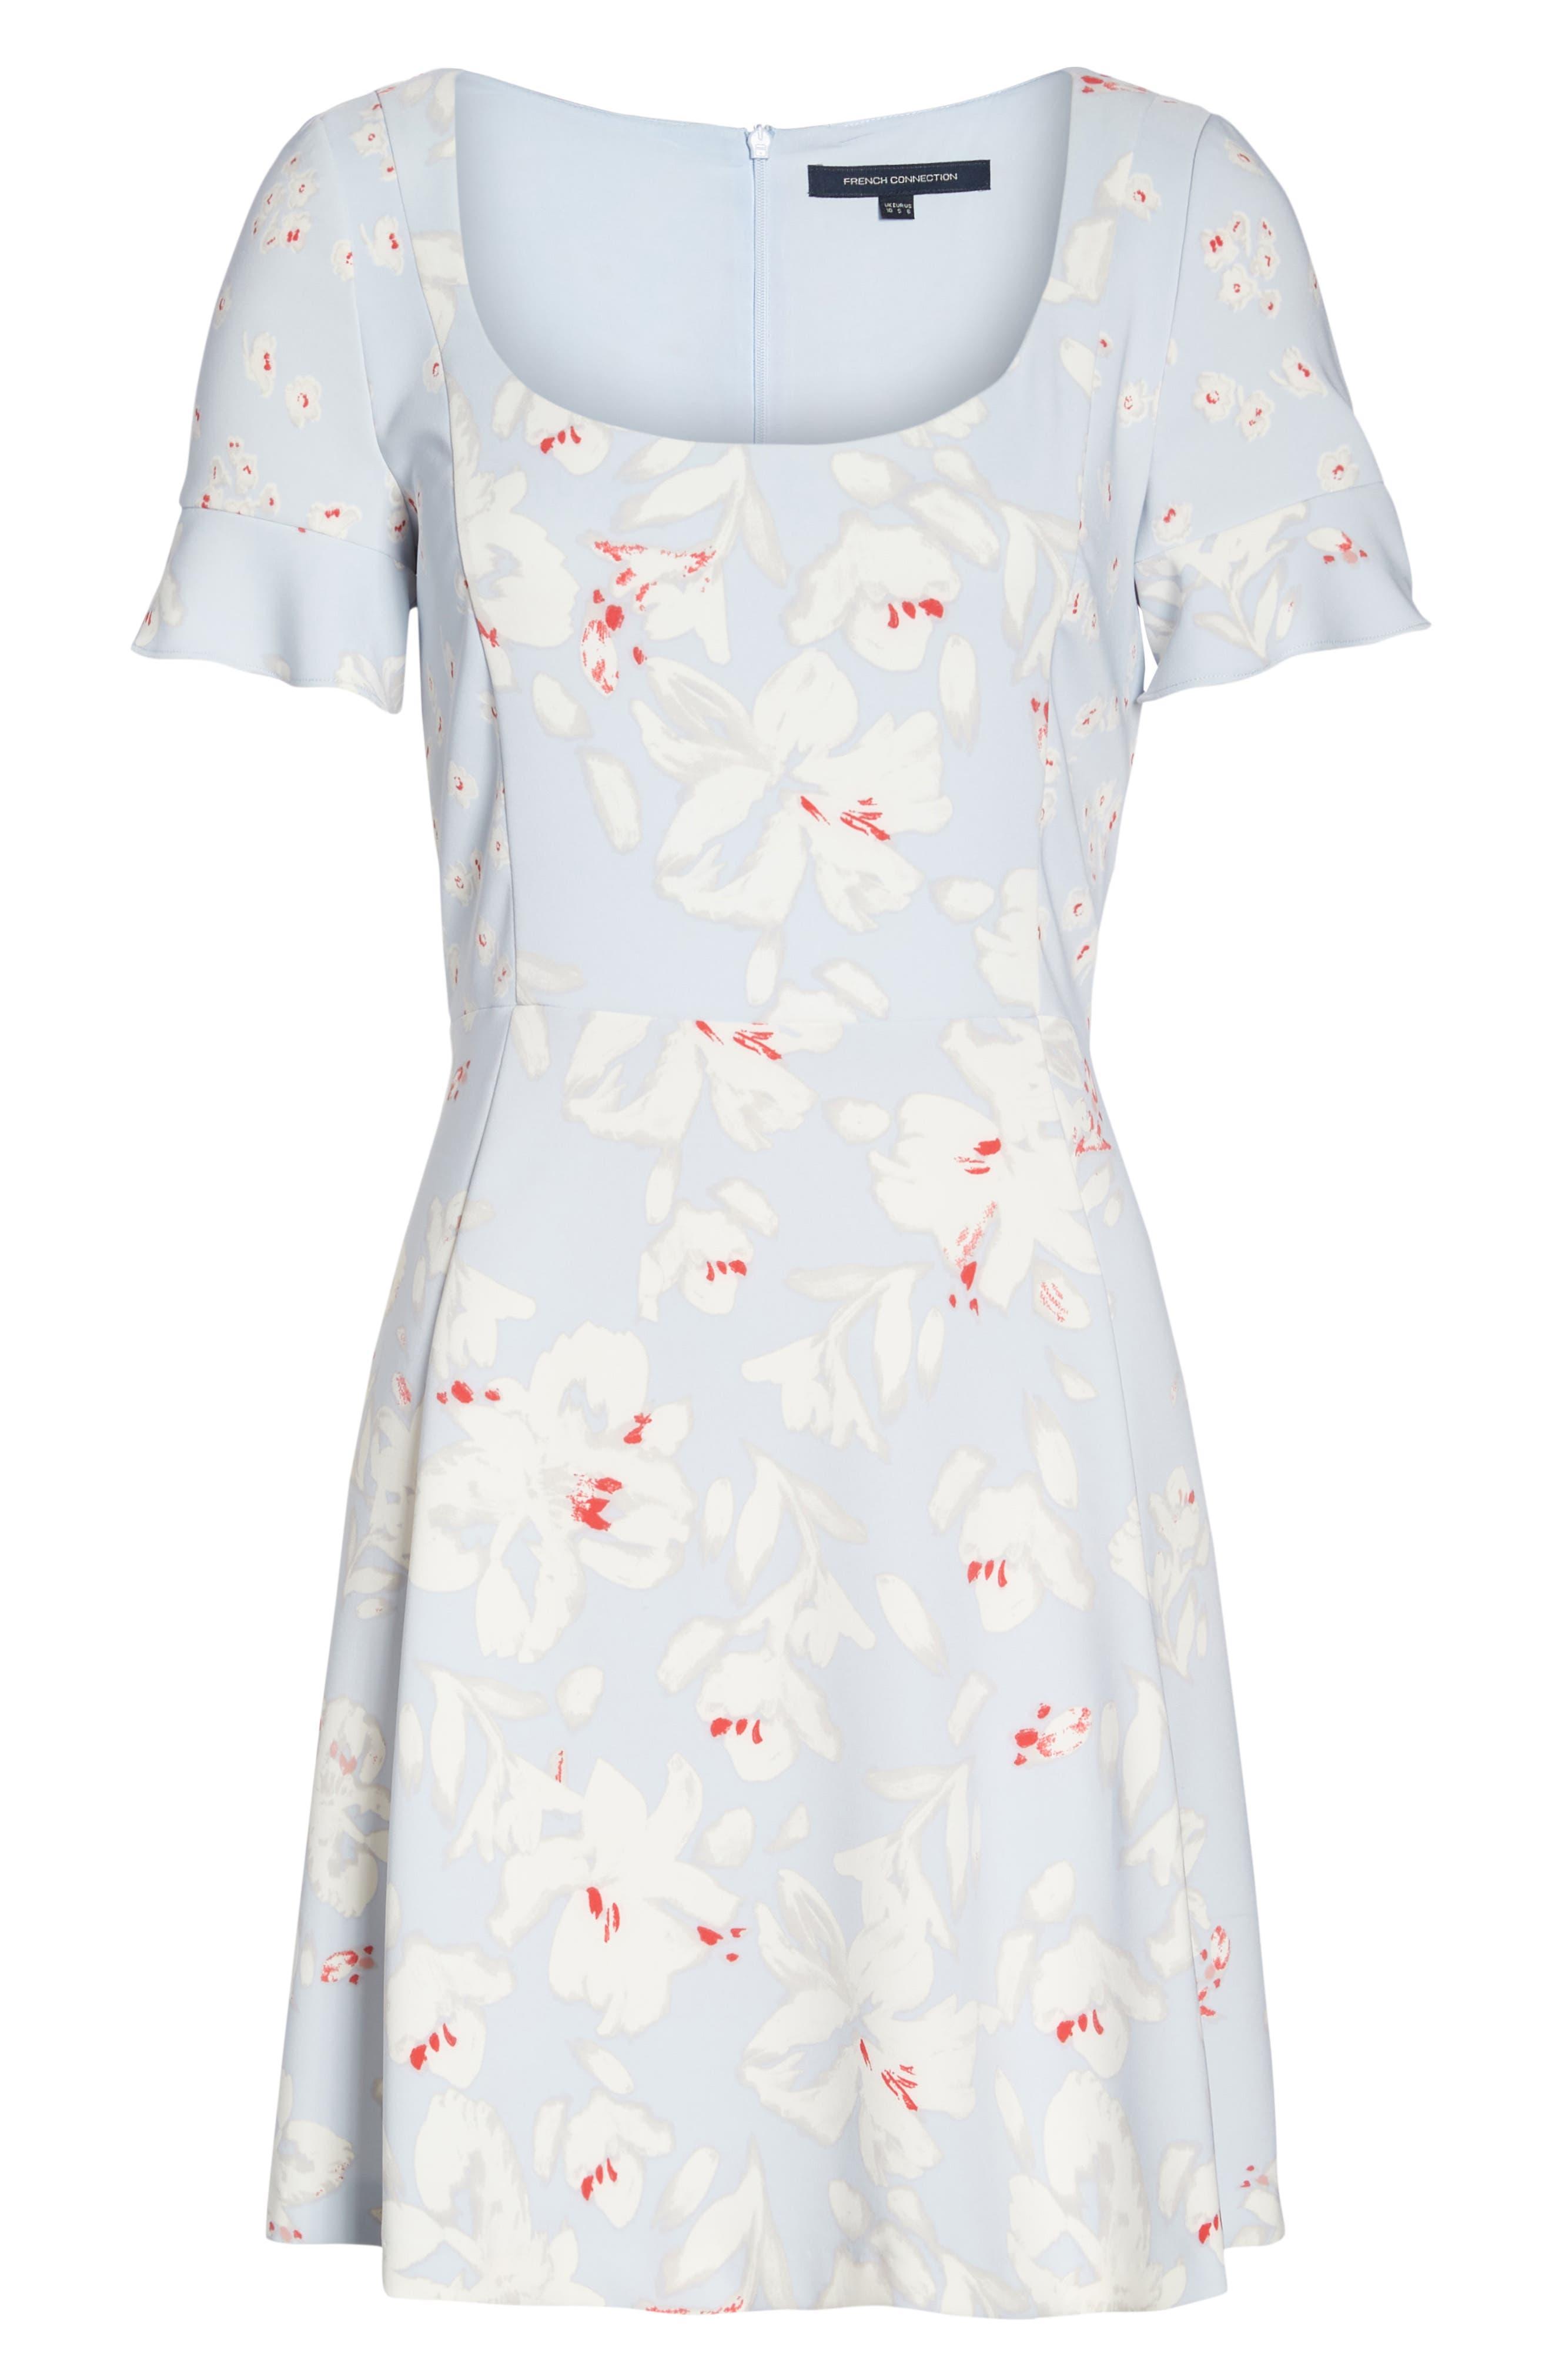 Alba Scoop Neck A-Line Dress,                             Alternate thumbnail 7, color,                             450